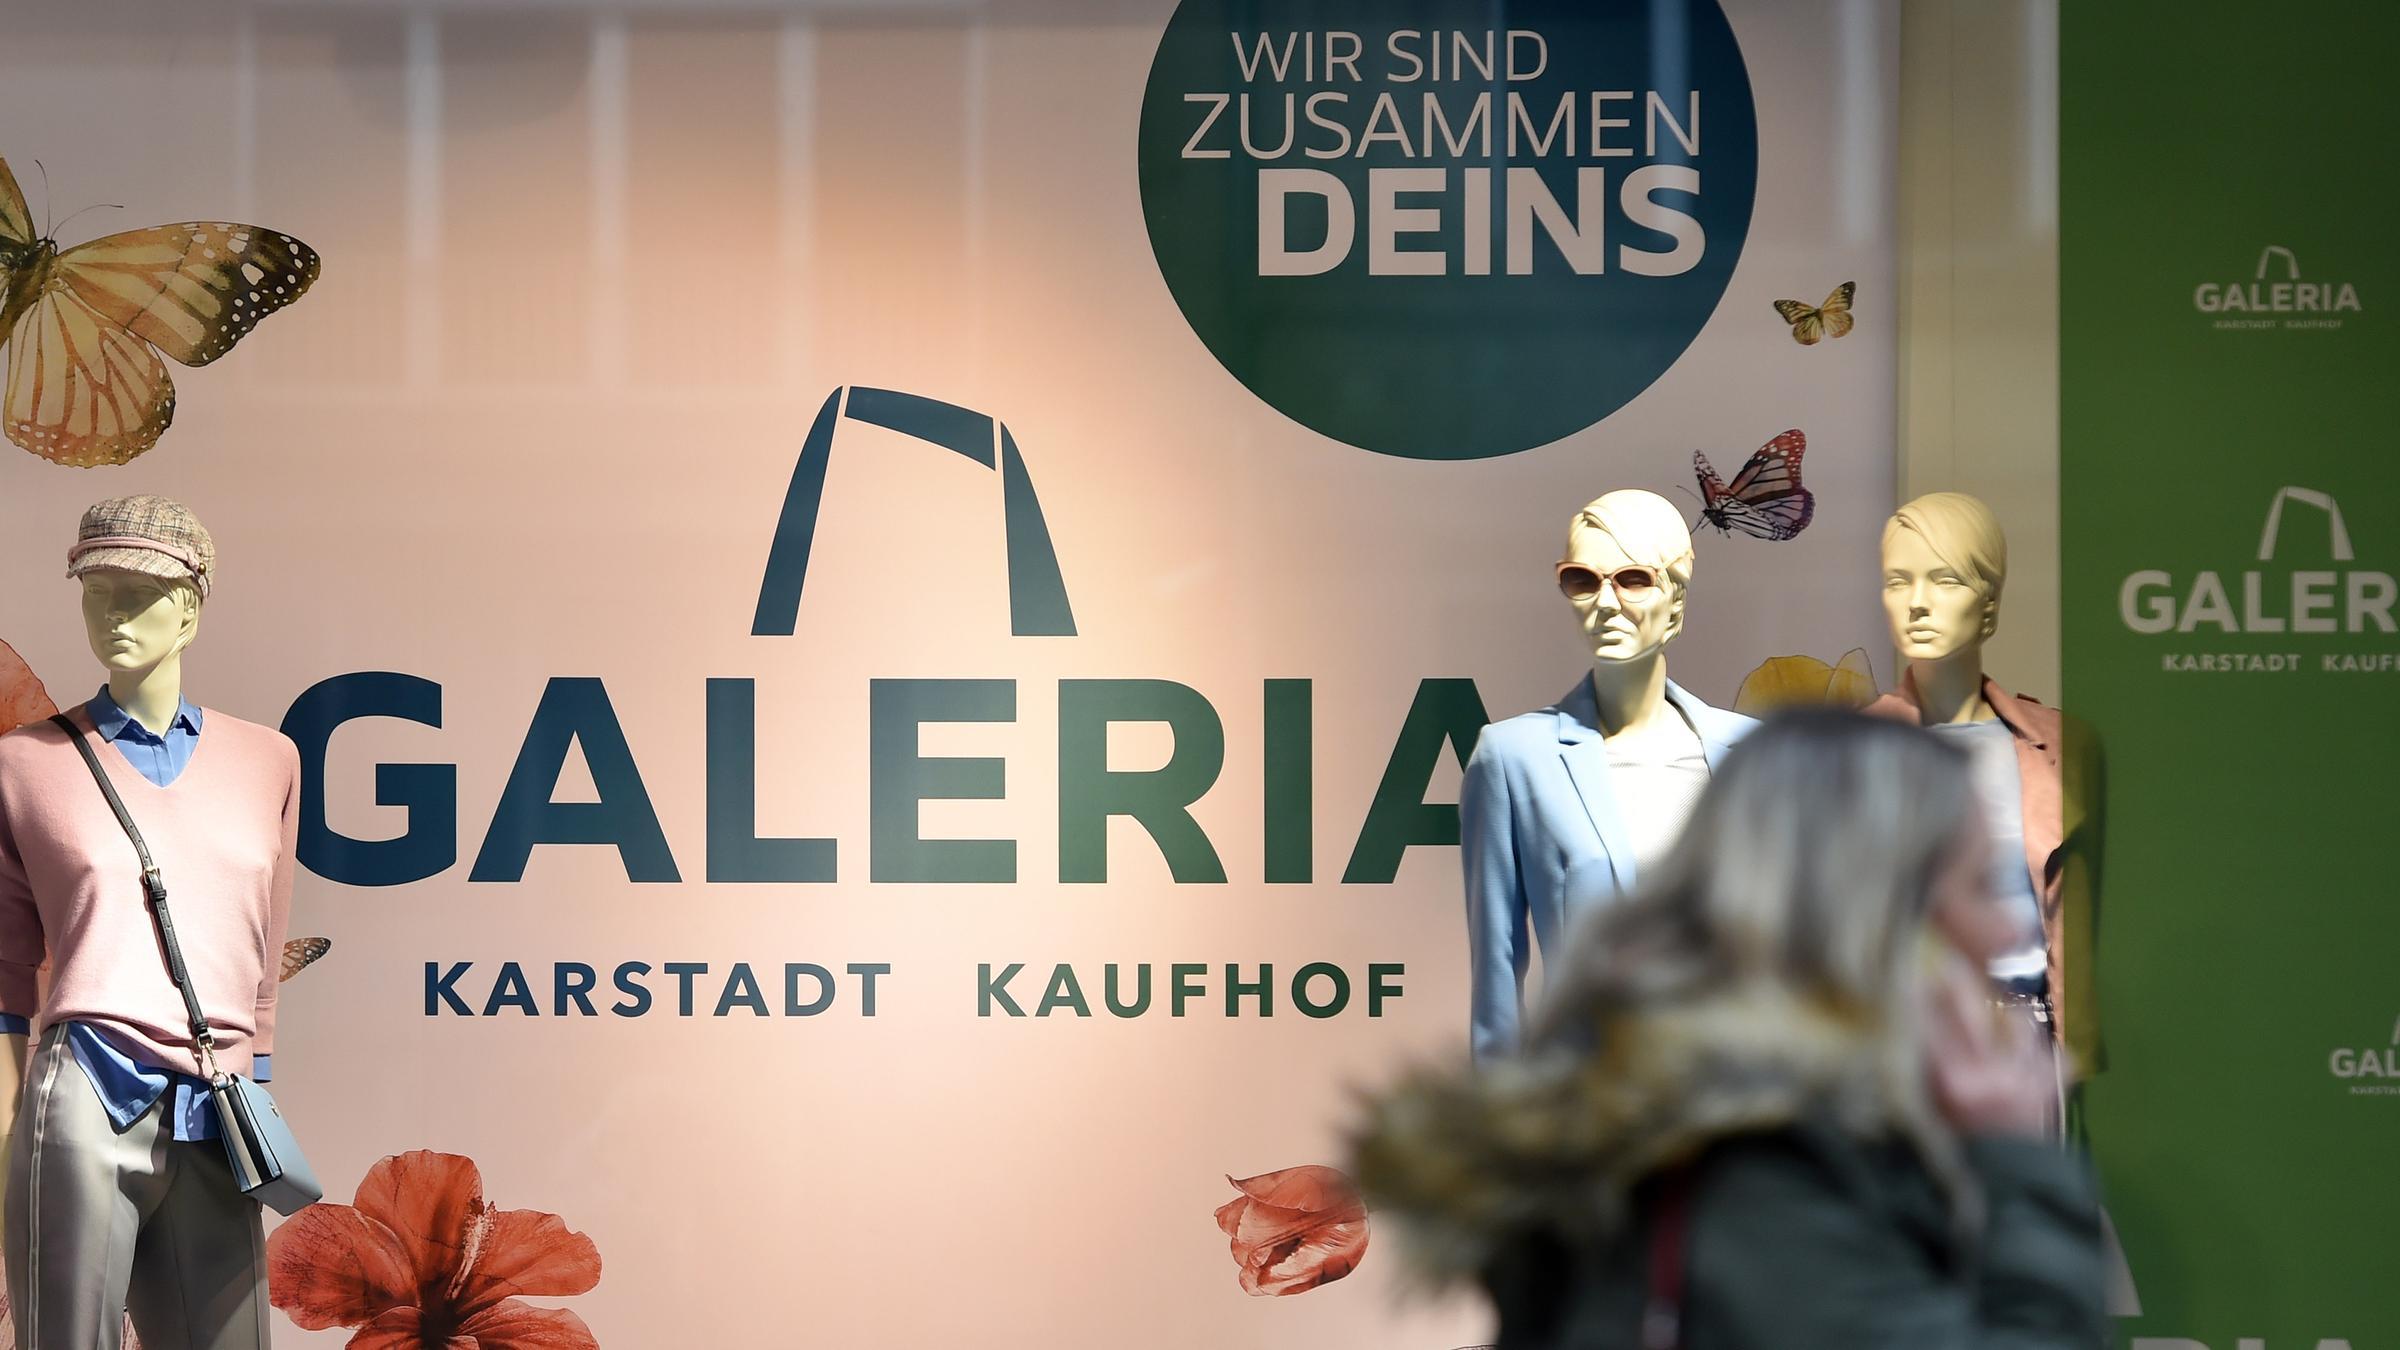 1d15b43d0e René Benko übernimmt Kontrolle: Karstadt-Kaufhof in einer Hand: Was das  bedeutet - ZDFmediathek